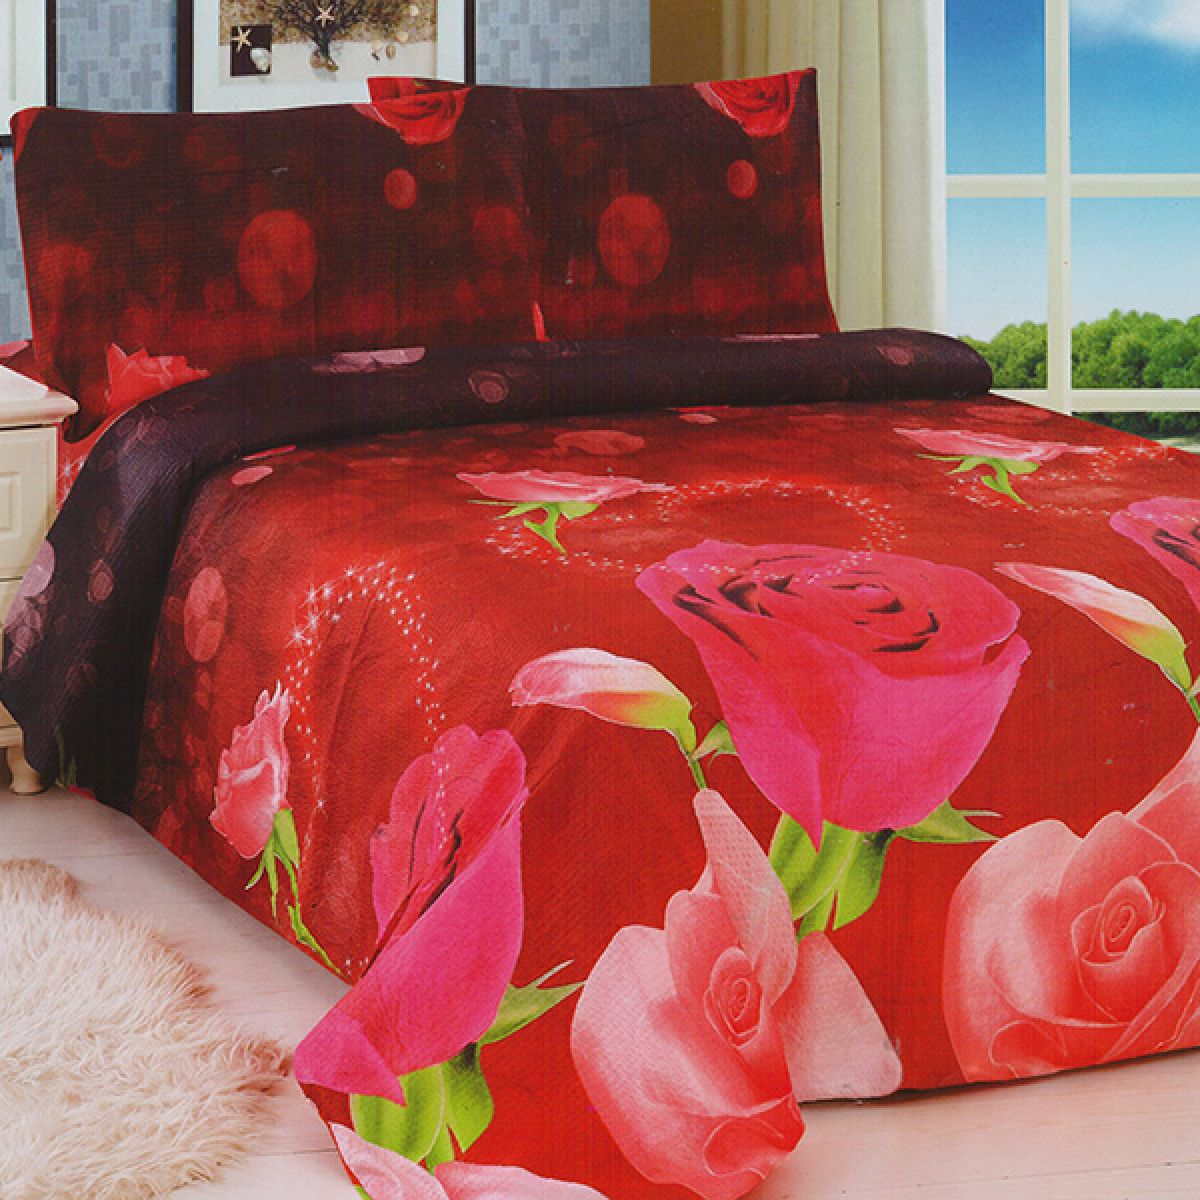 Cheap Beddings - TPR-YP-359 - 220x200cm - 4 pcs